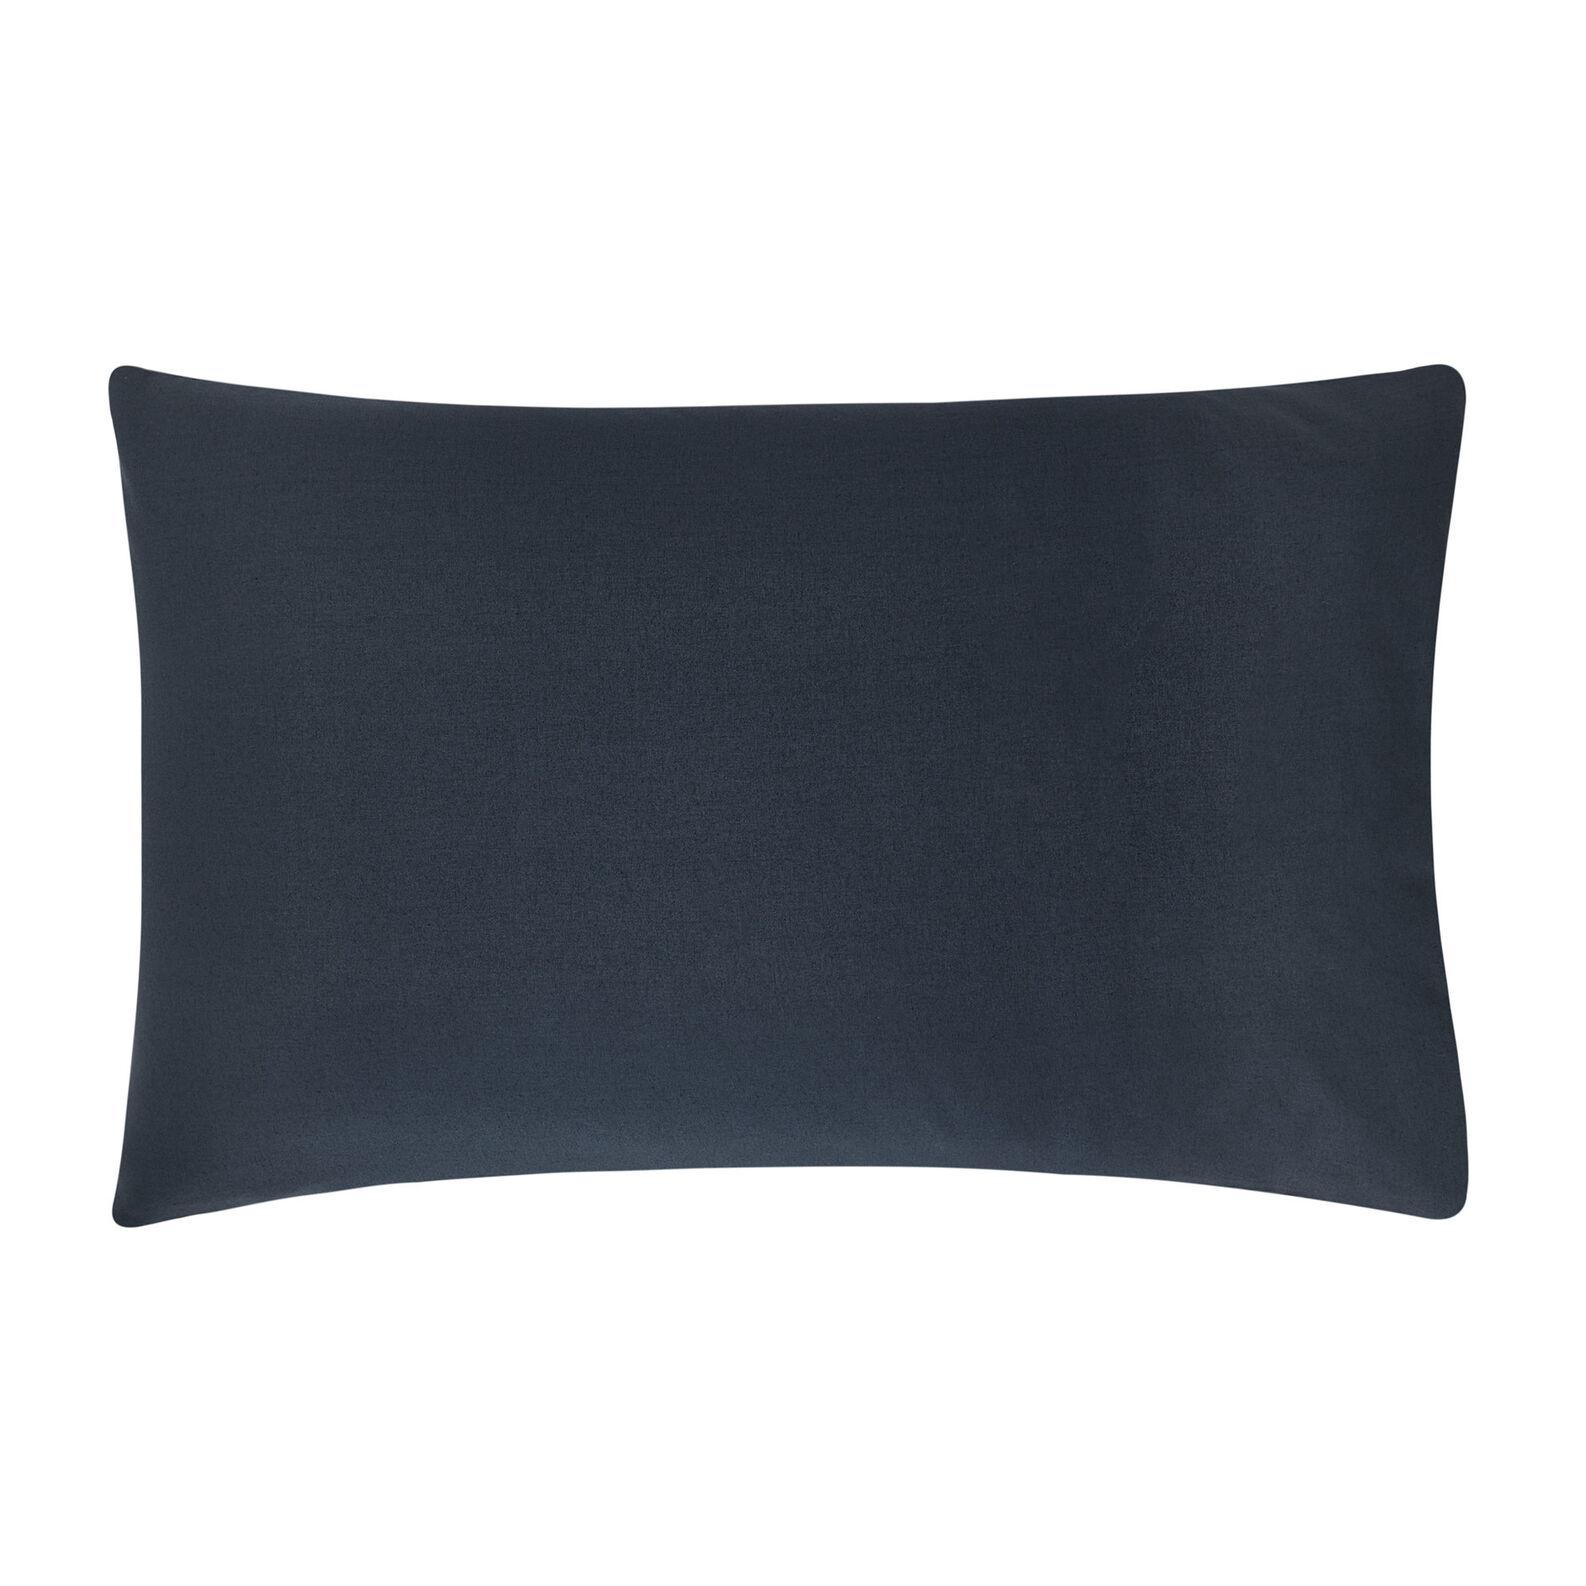 Pillowcase in solid colour 100% cotton.